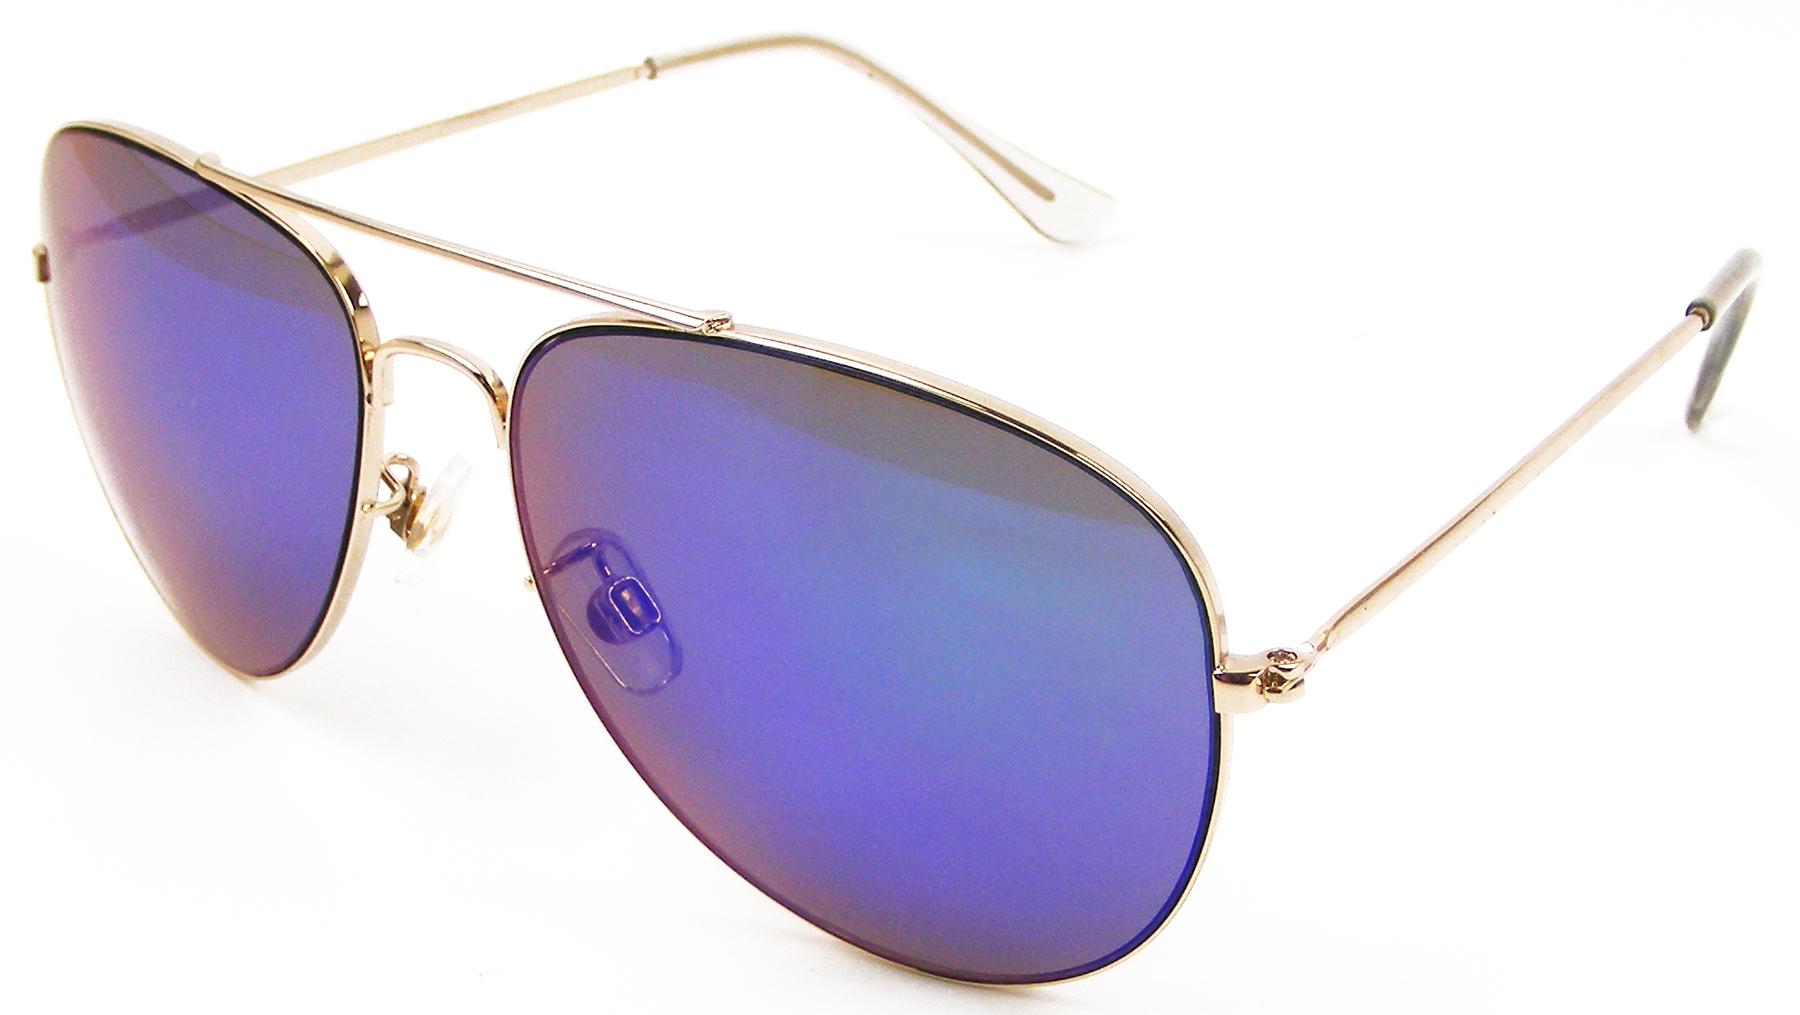 1f2a0e0d21 Anarchy Air Boss Sunglasses 10217452.QTM